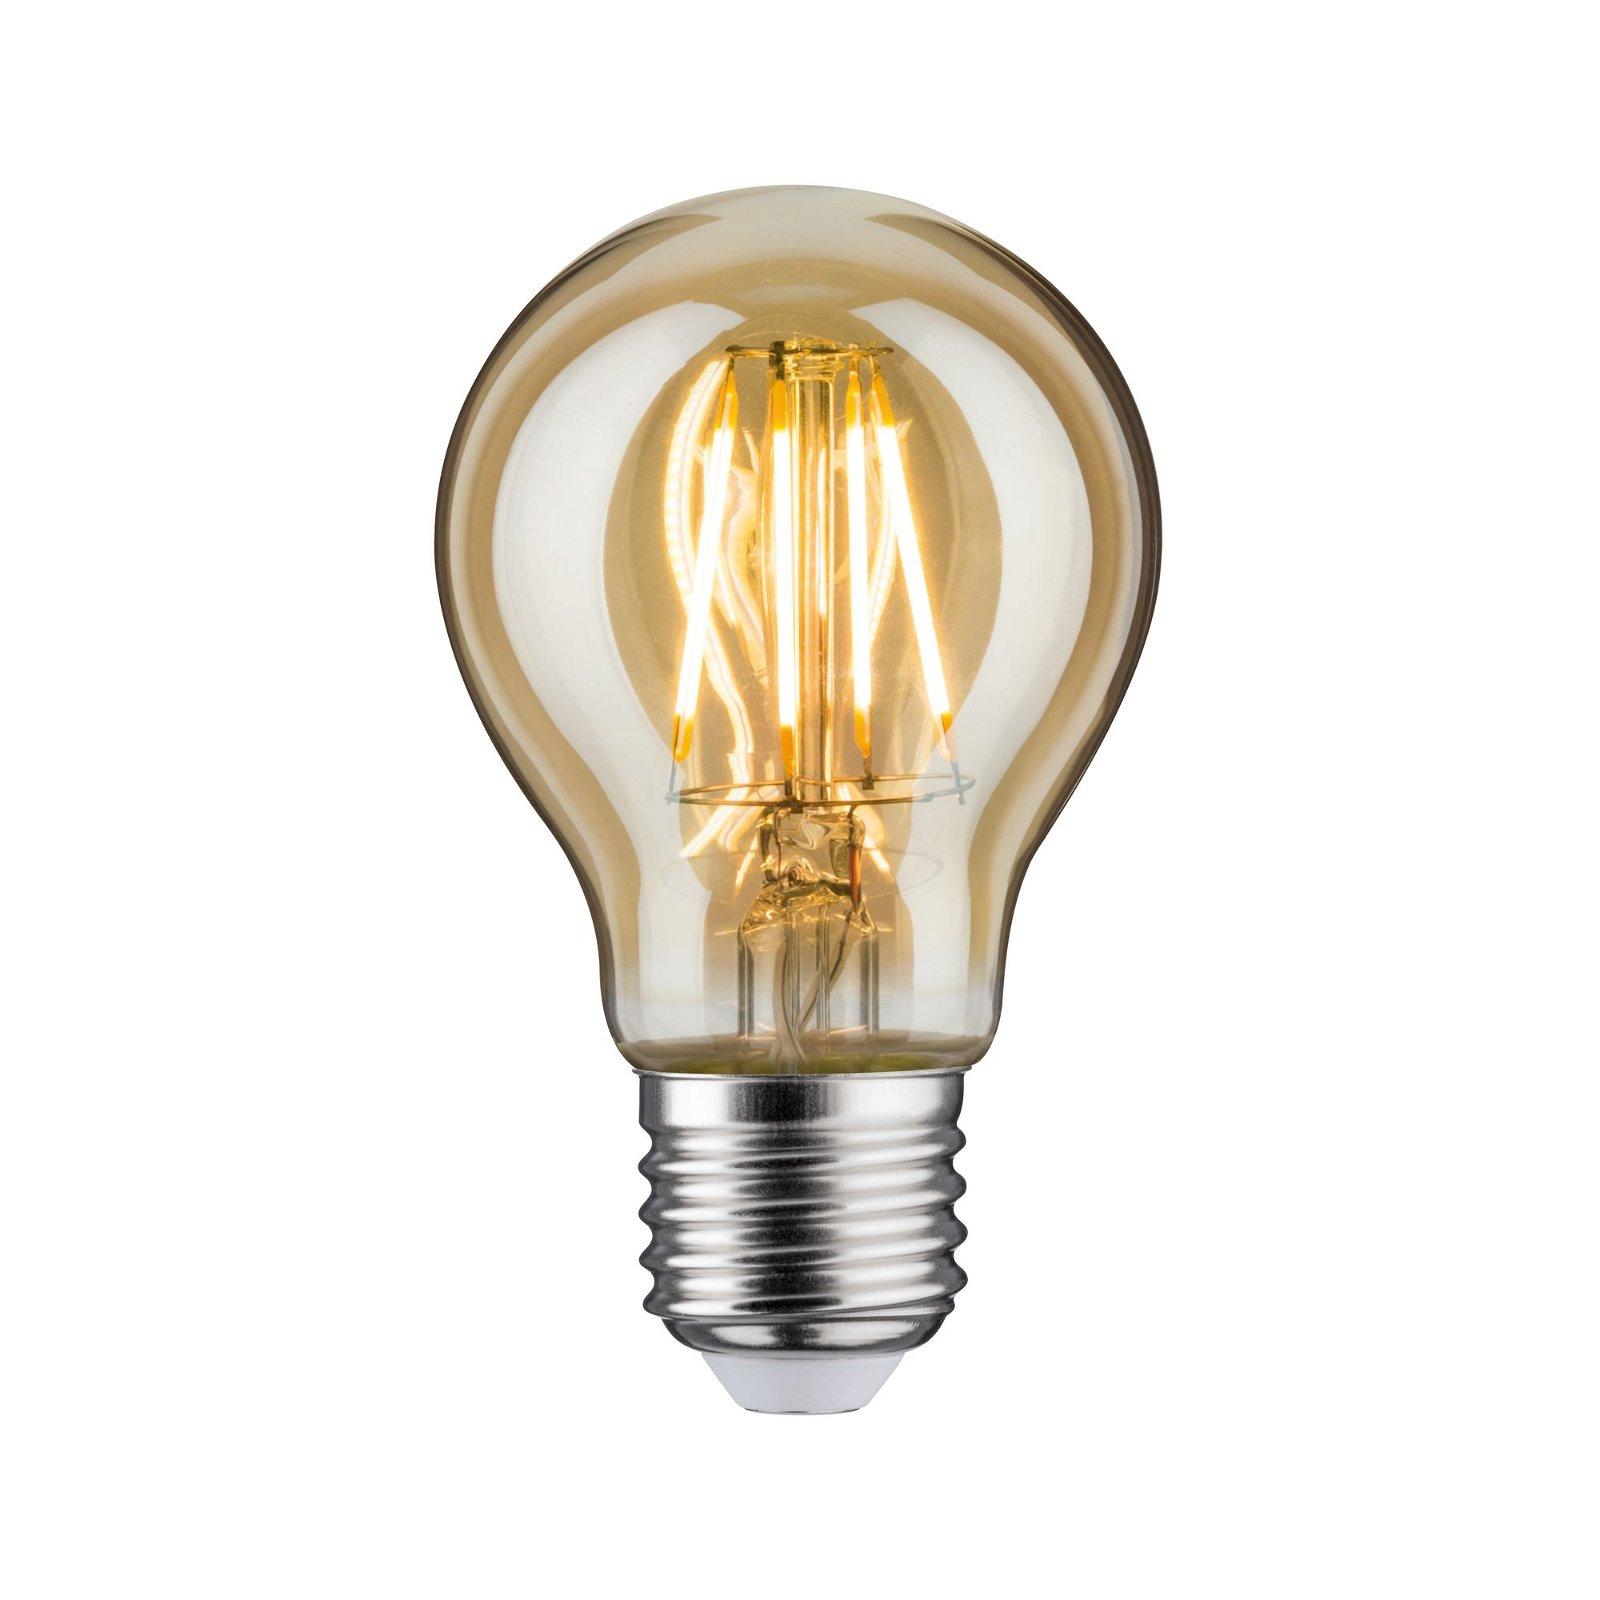 LED Birne E27 230V 500lm 4,7W 2500K Gold